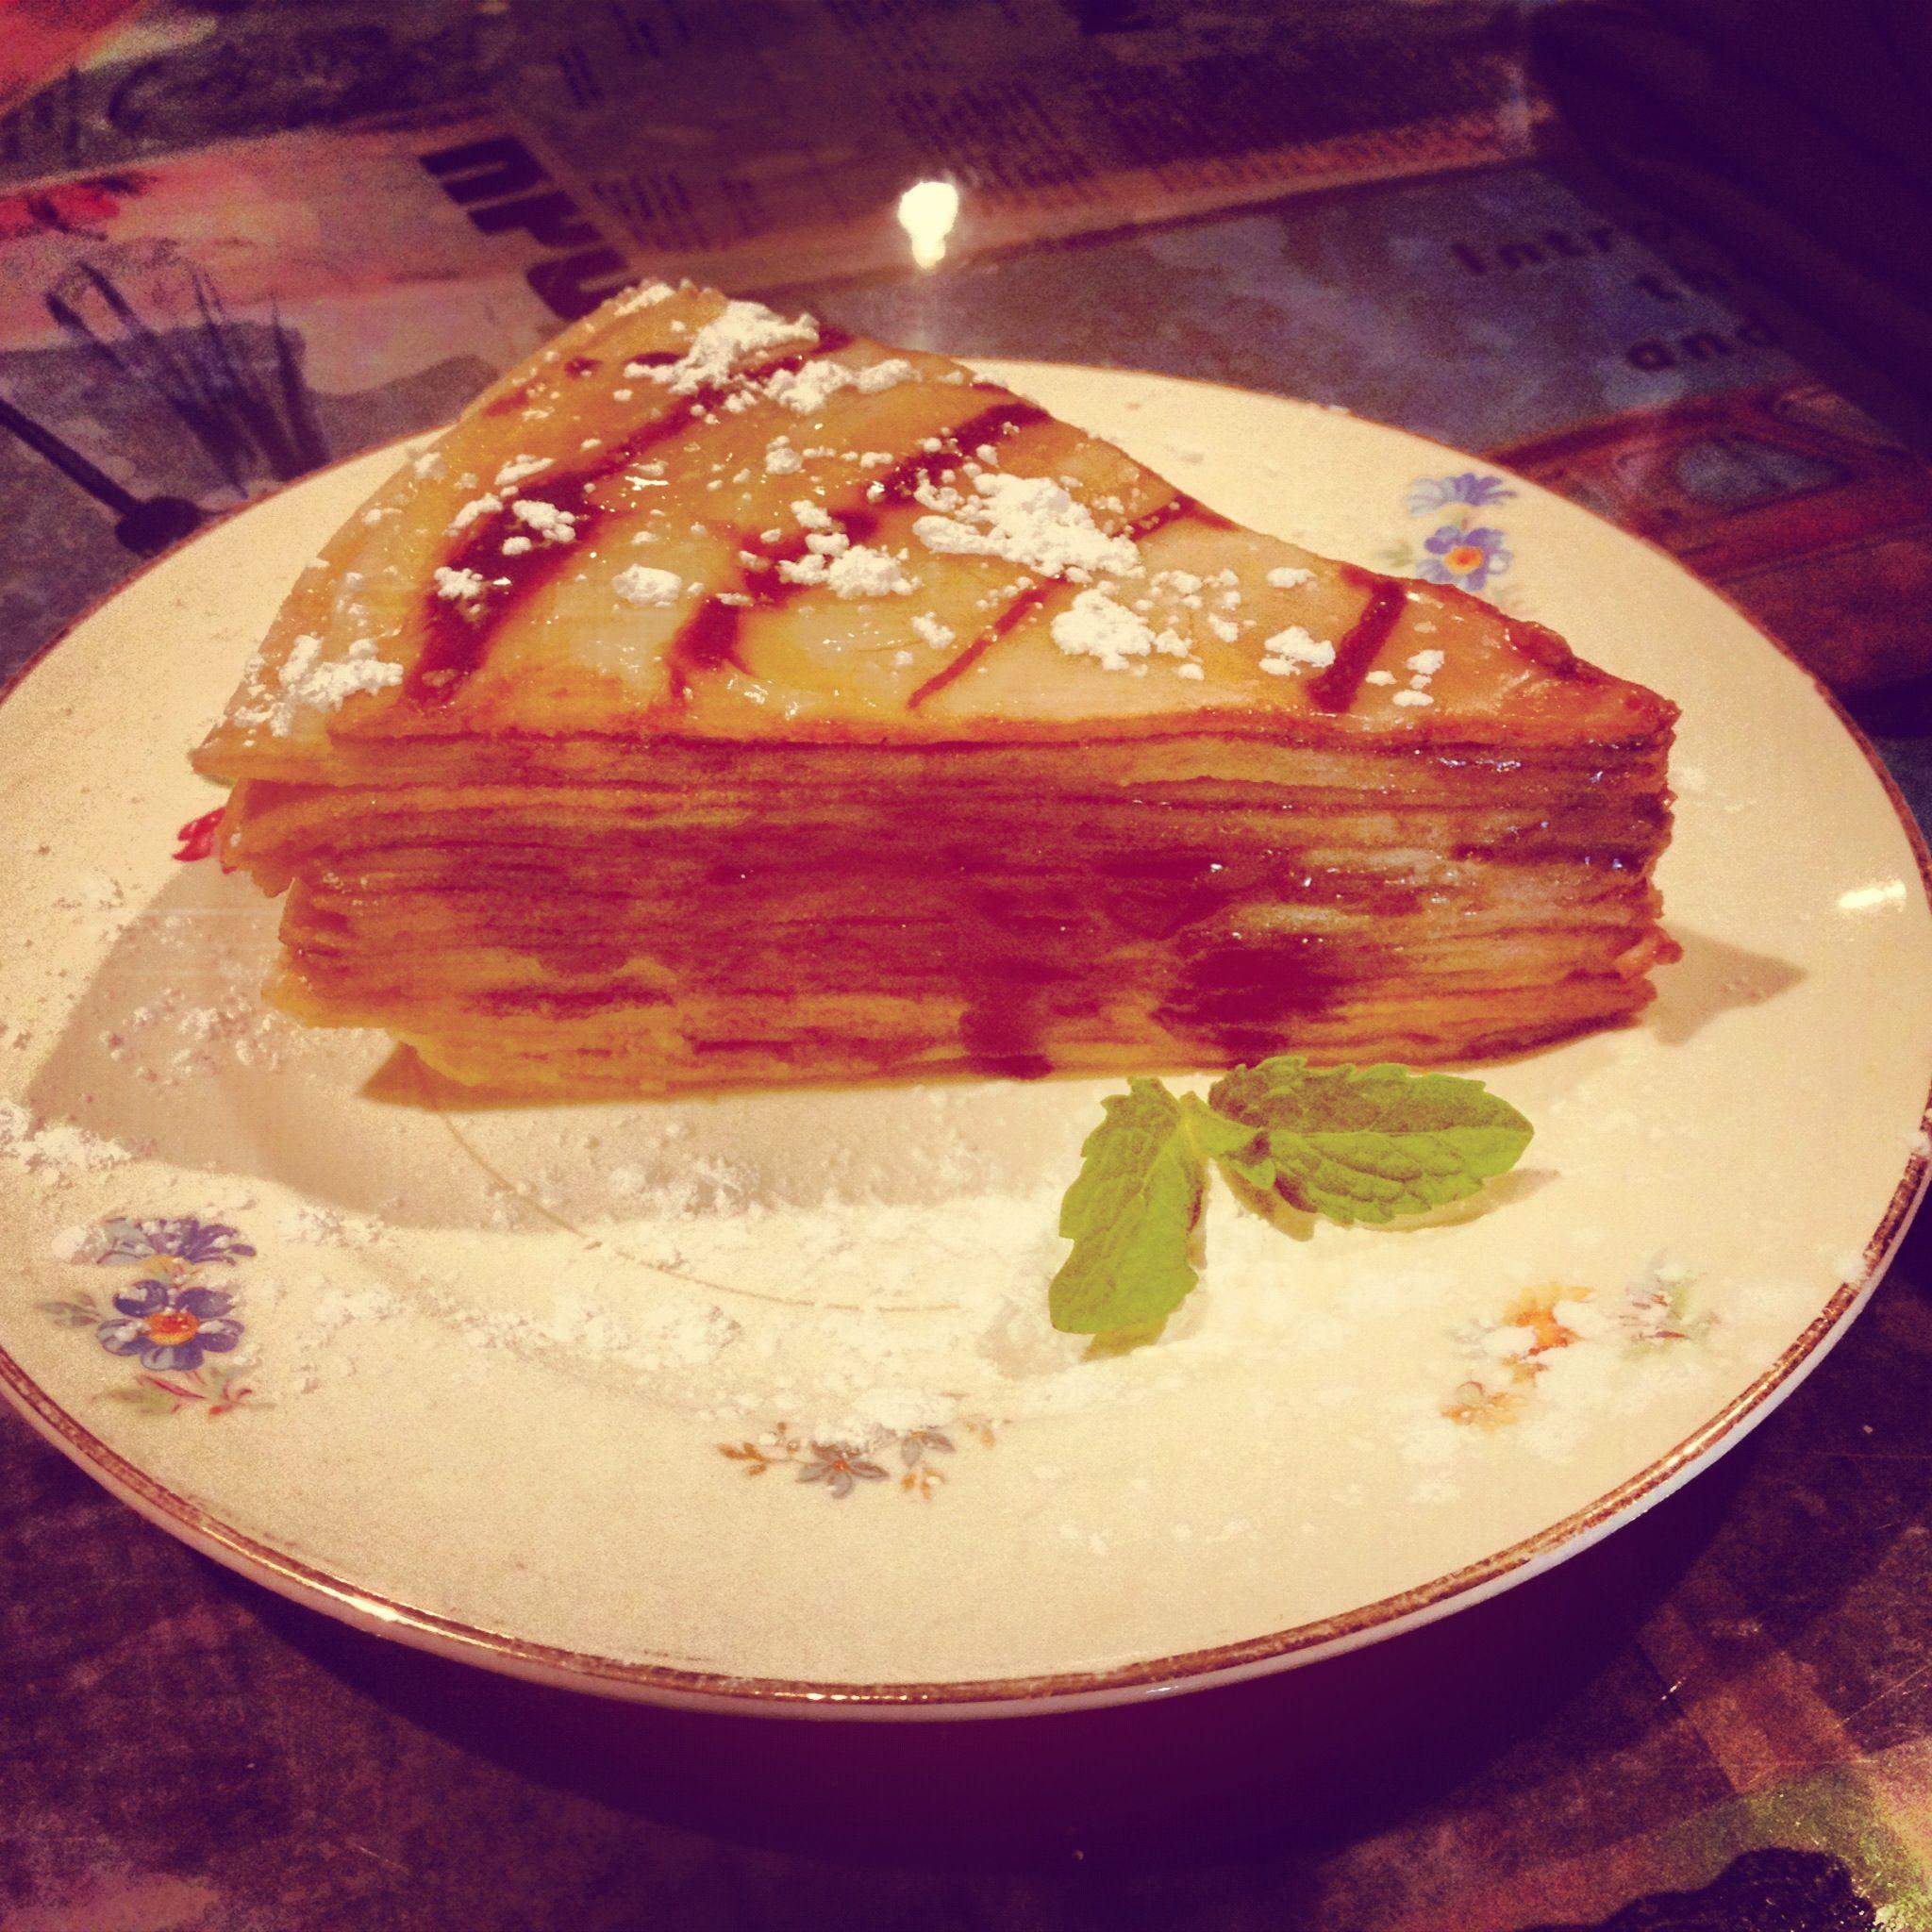 Blini Cake Dessert Crepes Russianhouse Food Desserts Breakfast